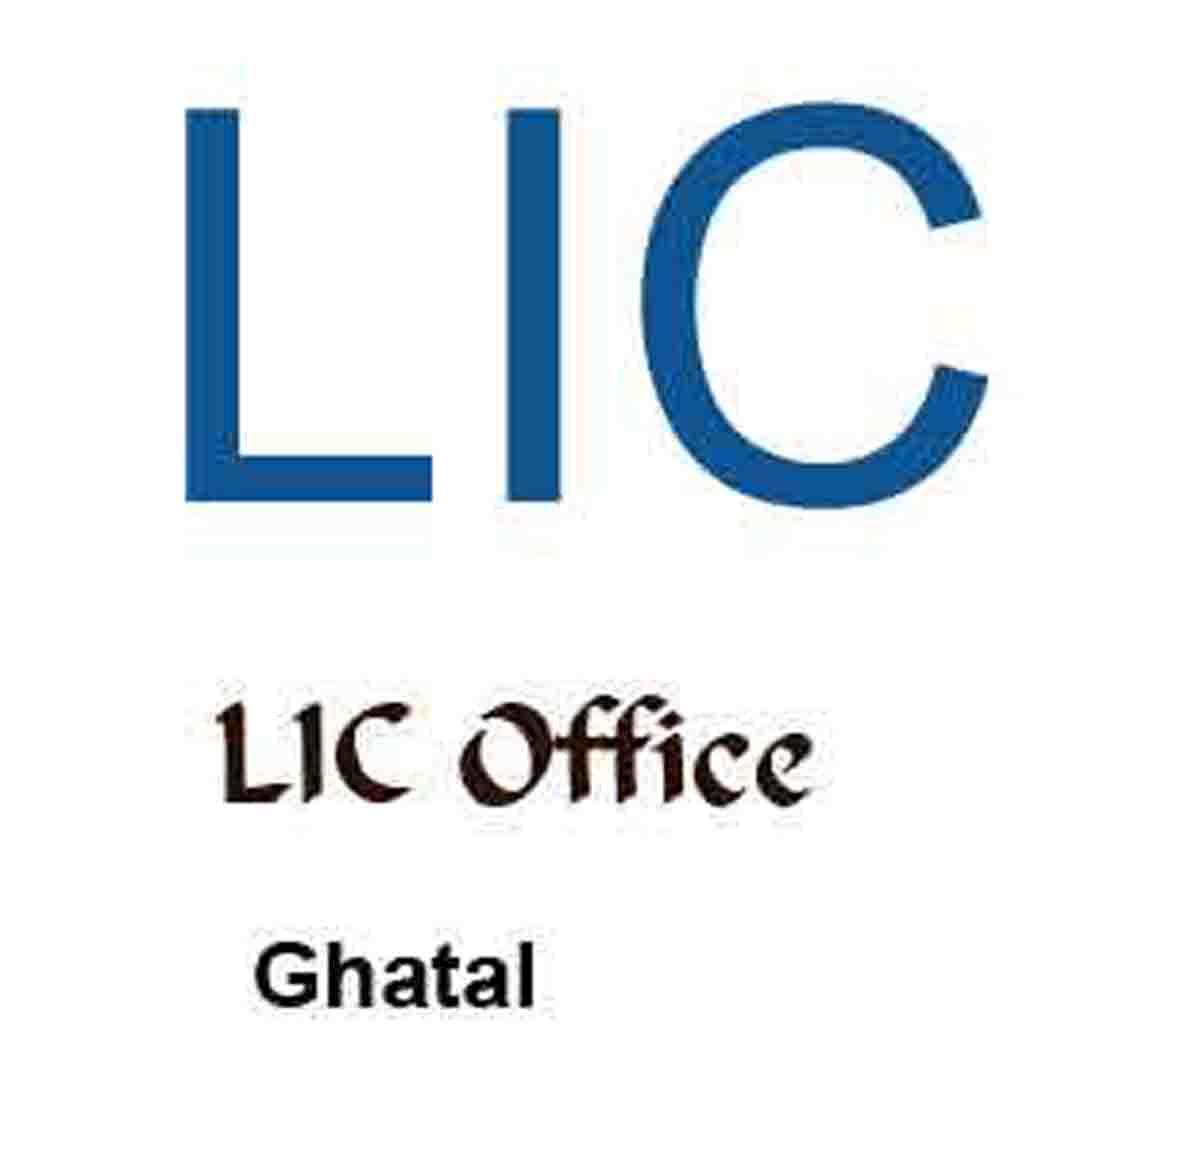 lic office ghatal